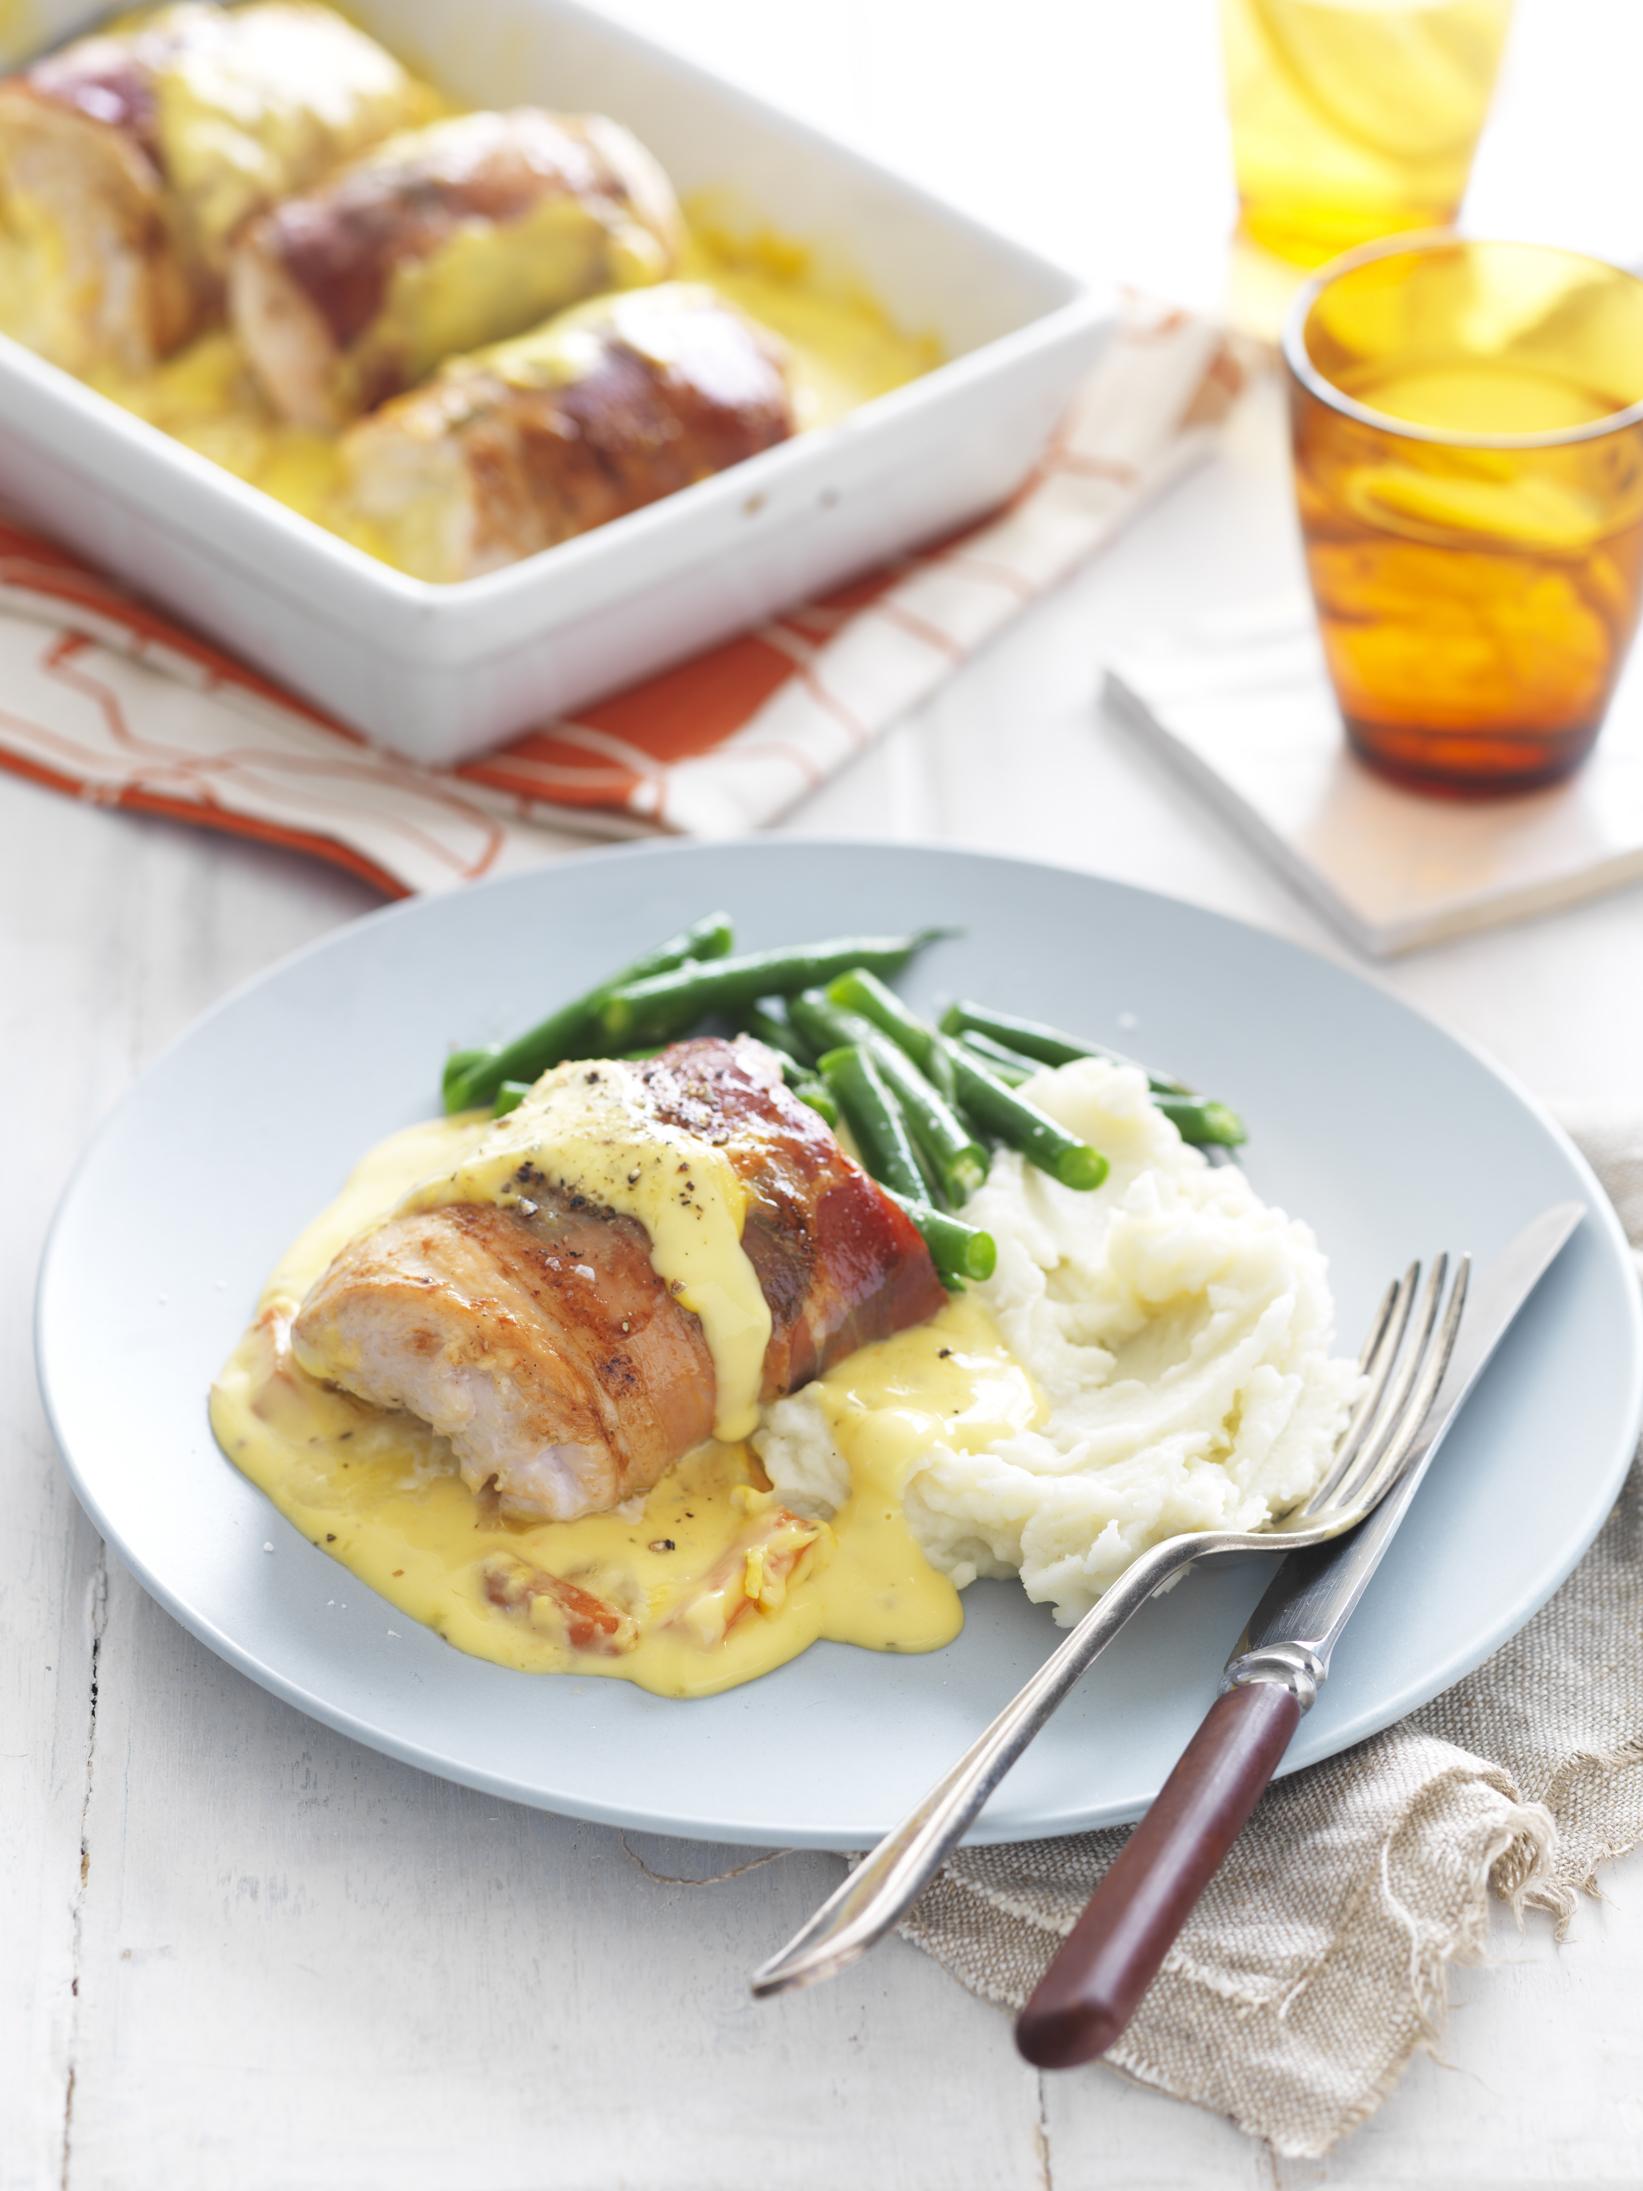 Involtini Chicken Baked With Honey Mustard Sauce Recipe Myfoodbook Chicken Tonight Honey Mustard Simmer Sauce Recipe